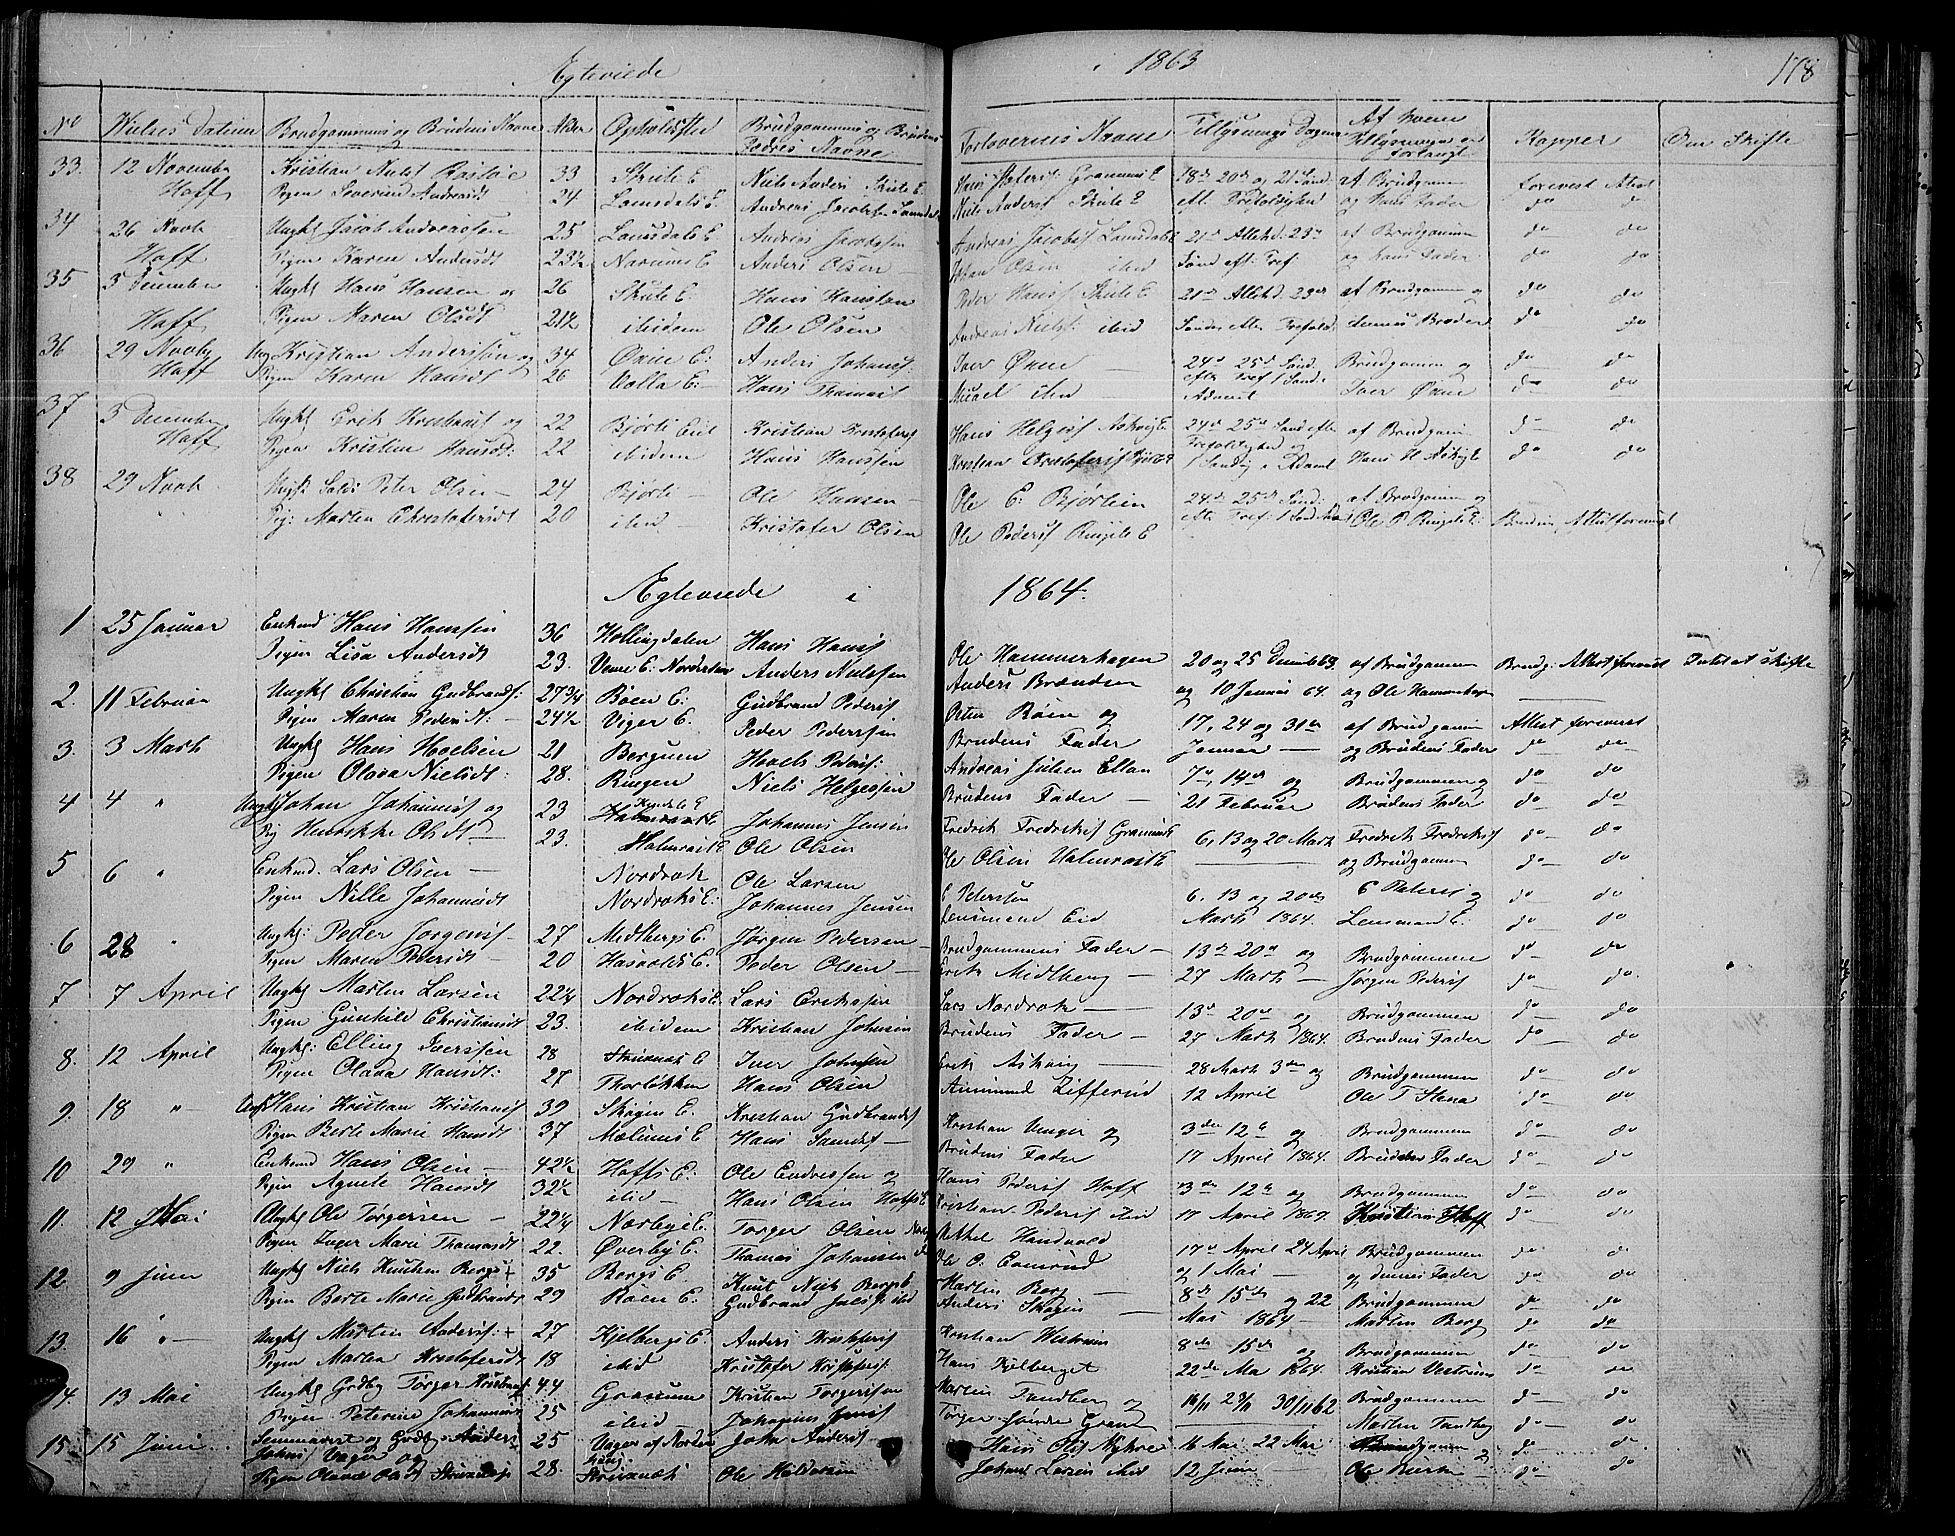 SAH, Søndre Land prestekontor, L/L0001: Klokkerbok nr. 1, 1849-1883, s. 178